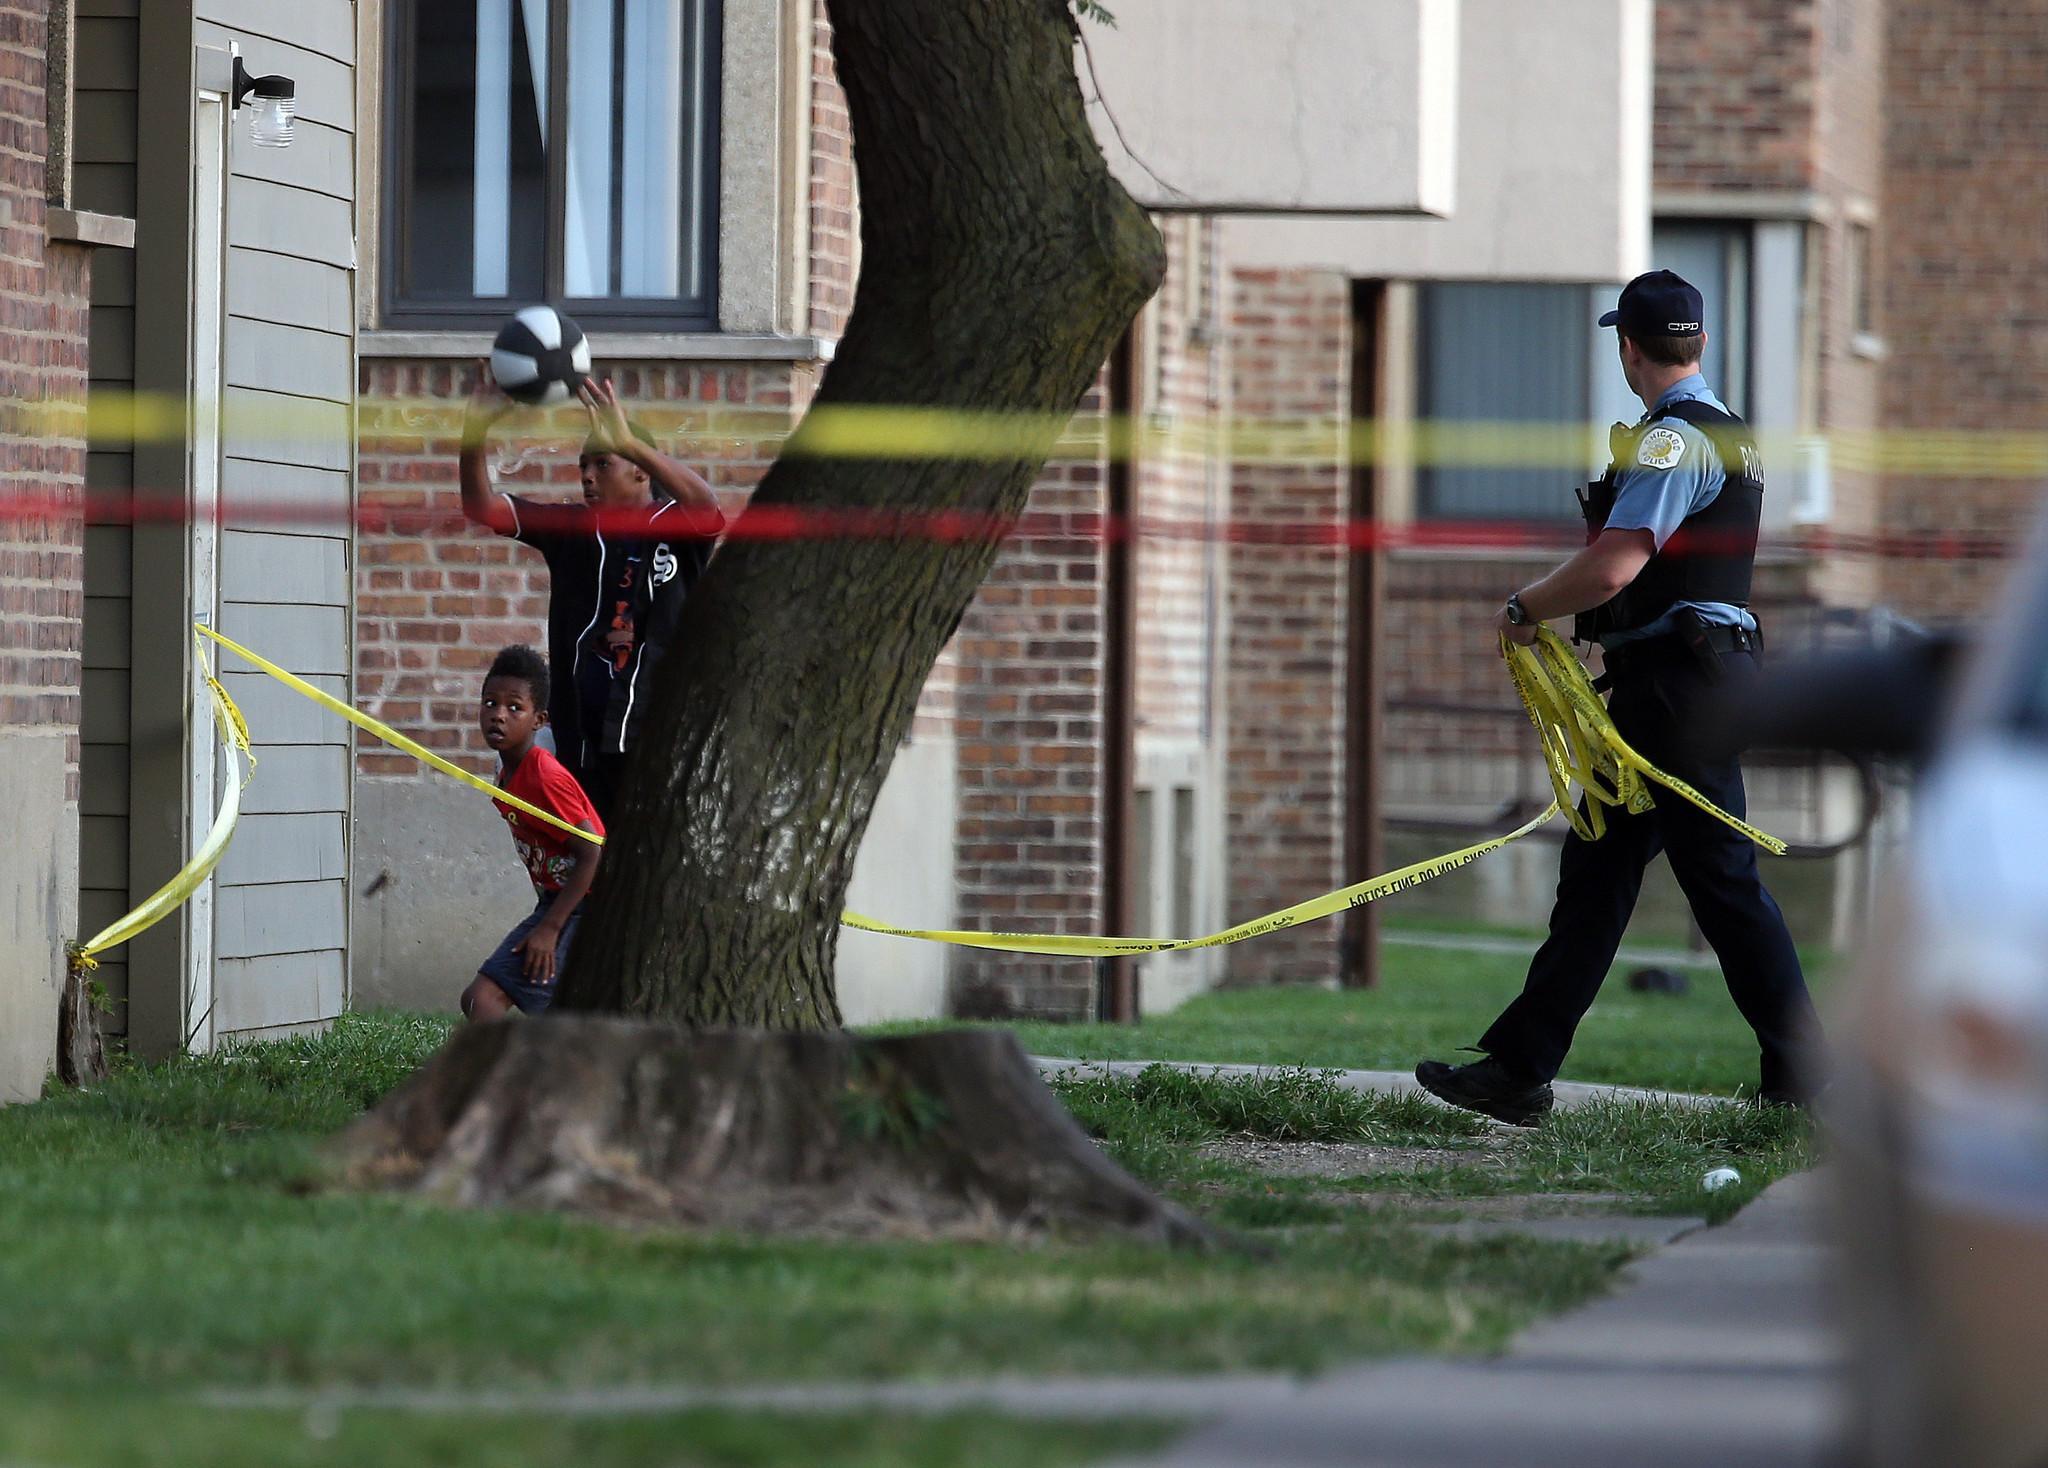 Ct-chicago-shootings-violence-20160826